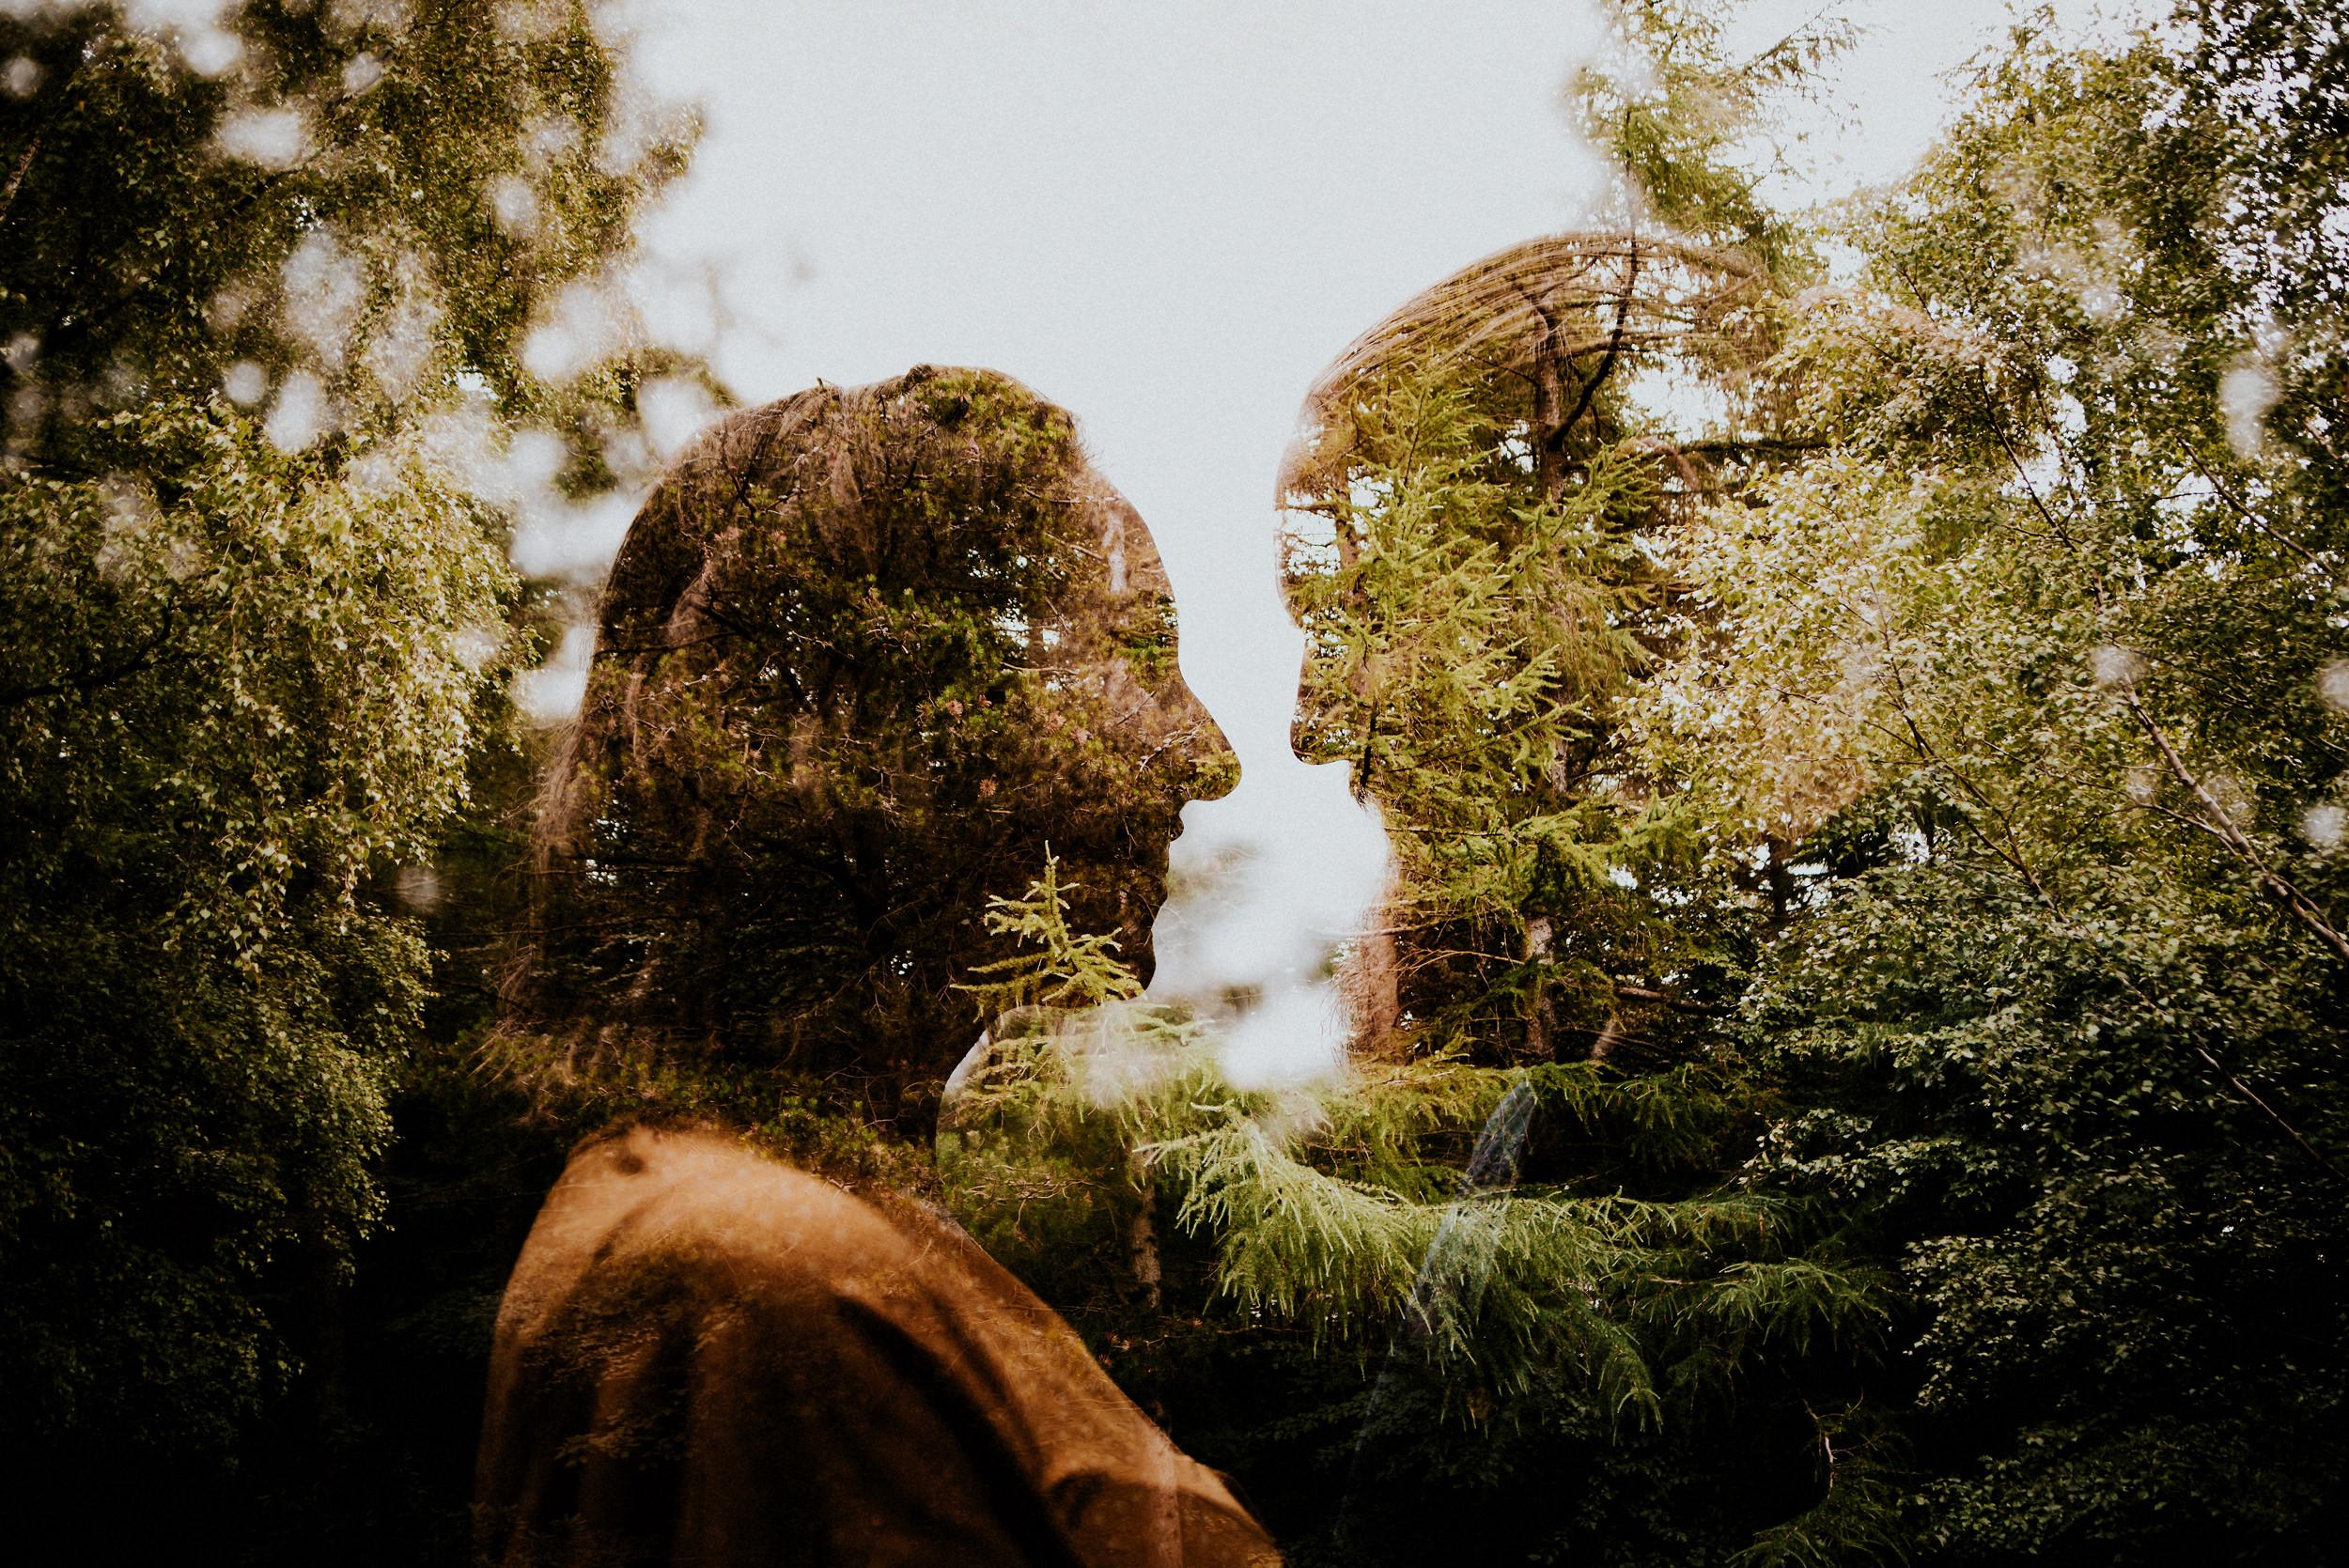 St-Ives-Park-Bingley-Engagement-Shoot-Alternative-Portraits-25.jpg